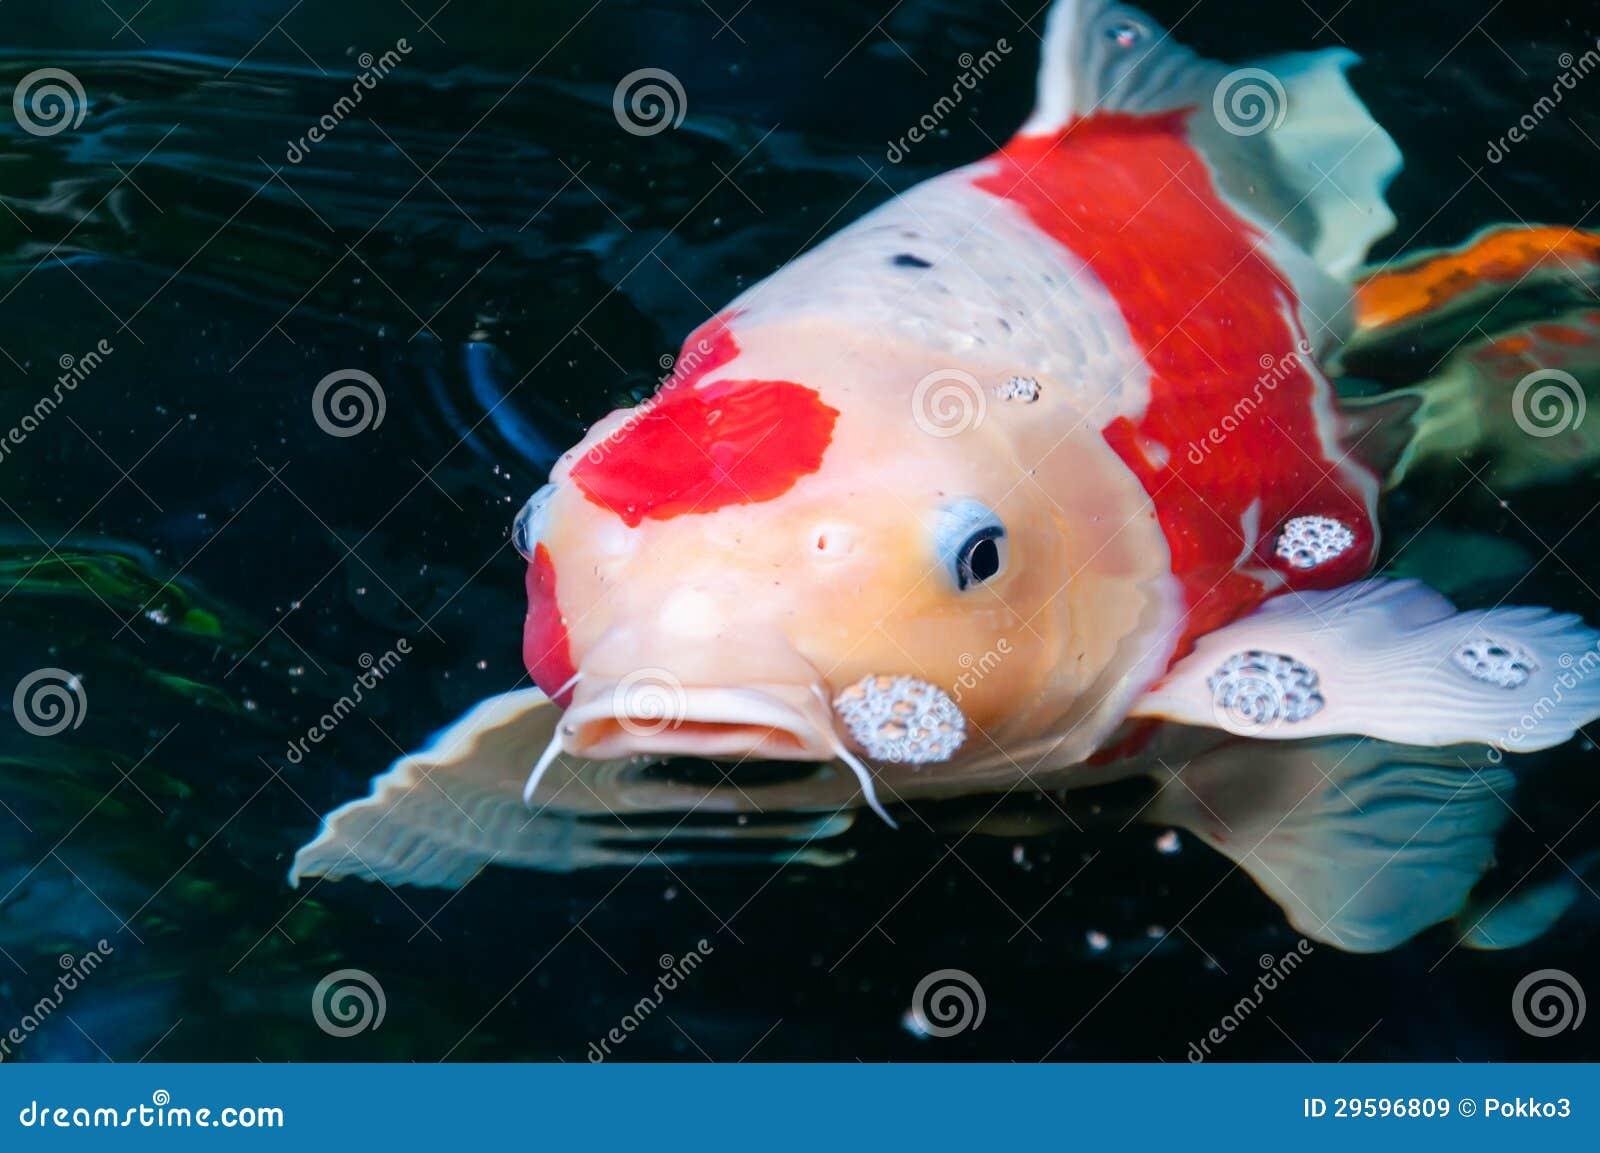 Beautiful koi fish royalty free stock images image 29596809 for Beautiful koi fish